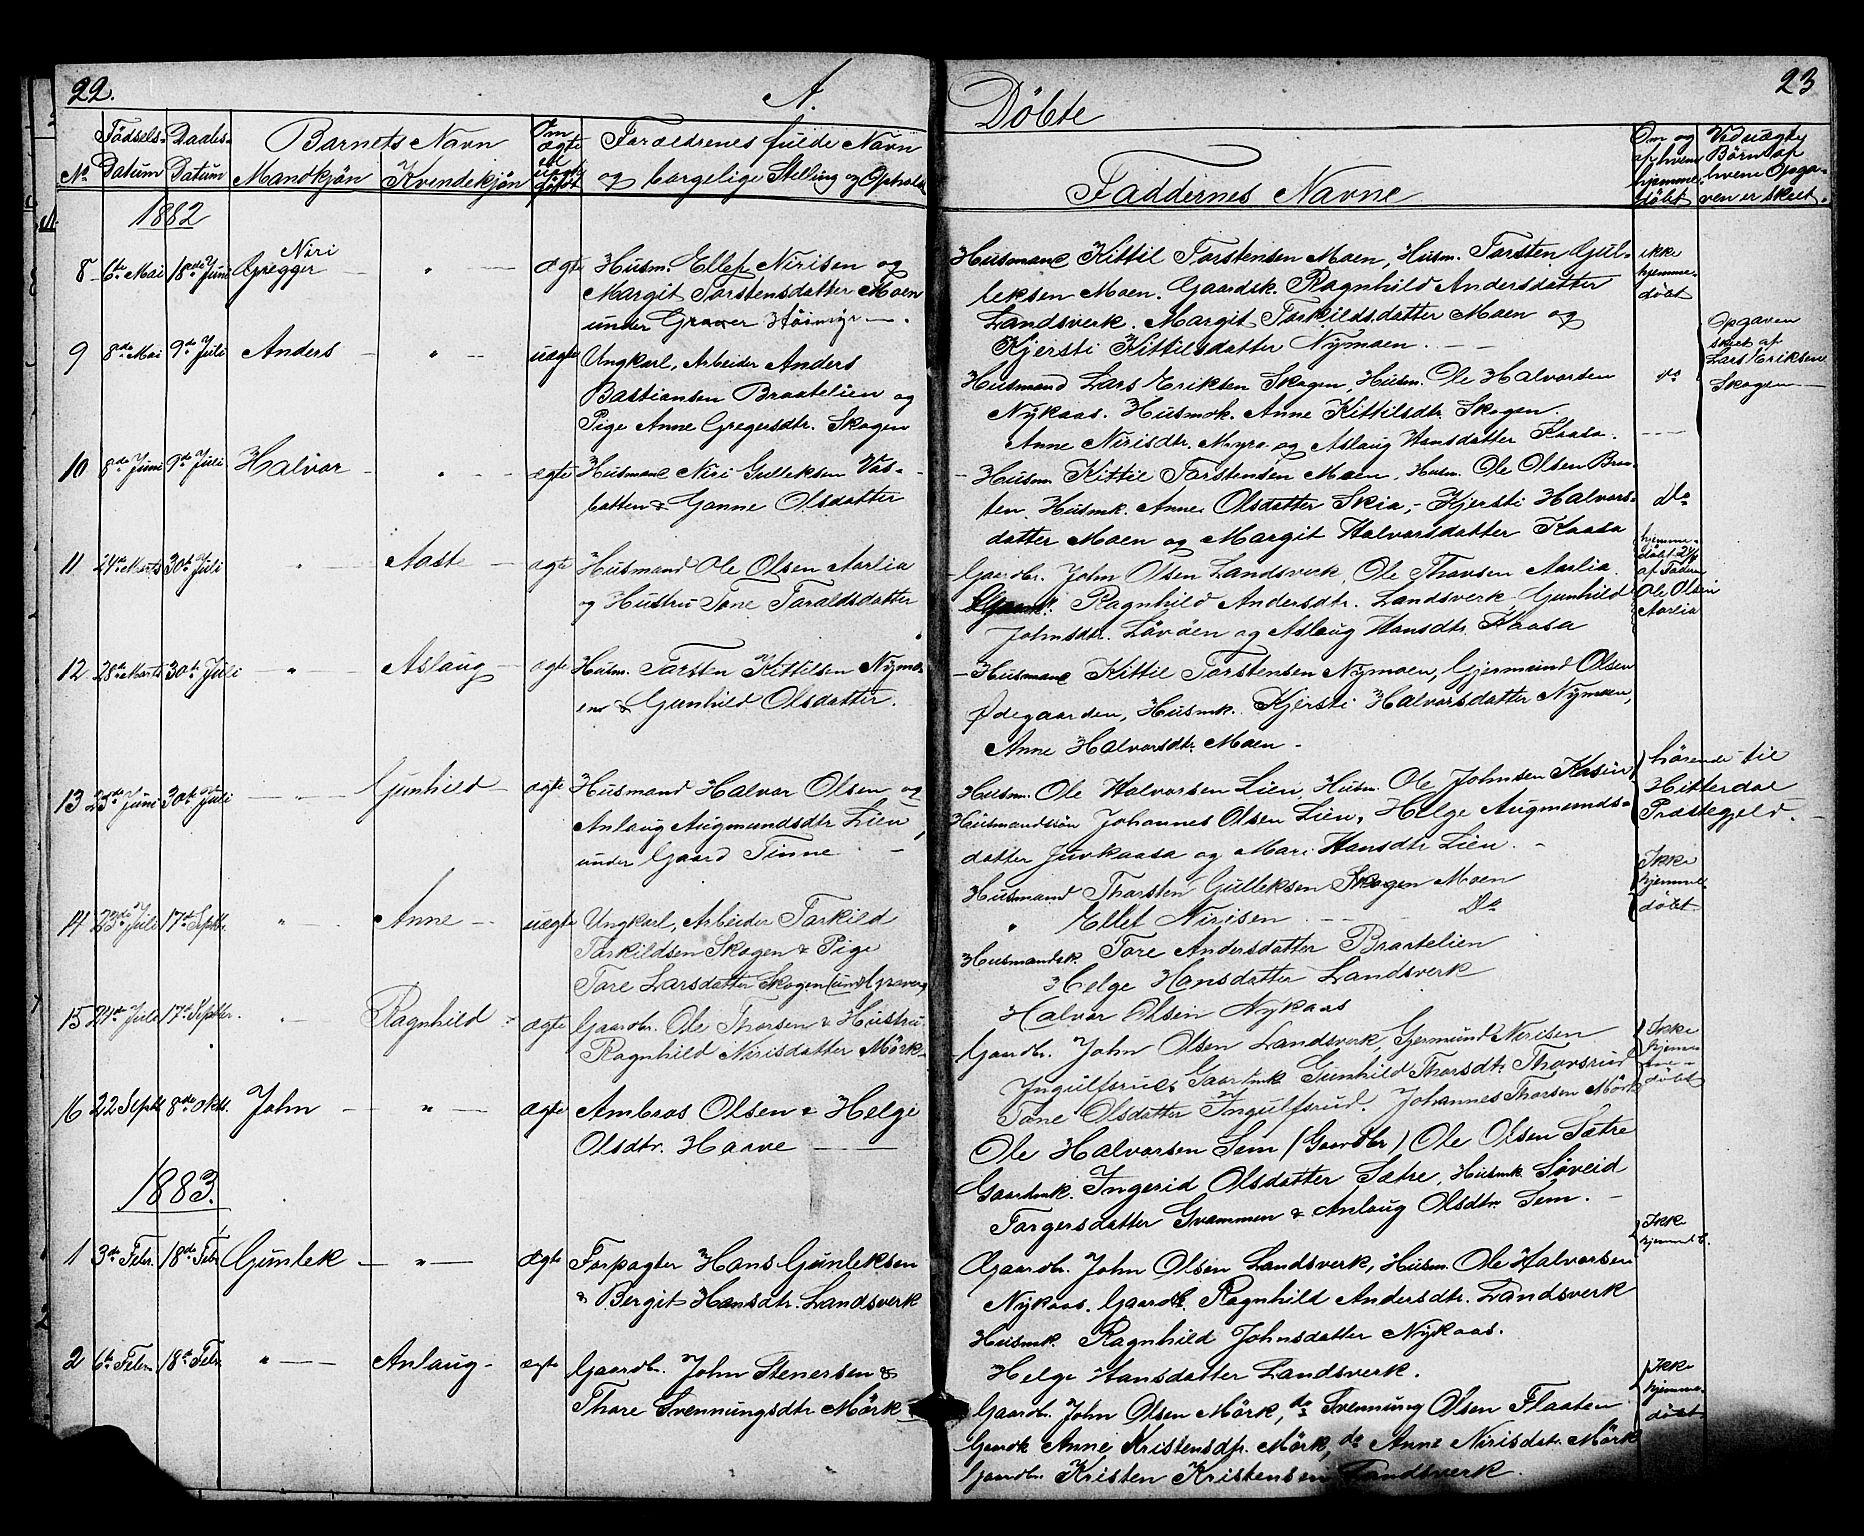 SAKO, Heddal kirkebøker, G/Gb/L0001: Klokkerbok nr. II 1, 1866-1887, s. 22-23